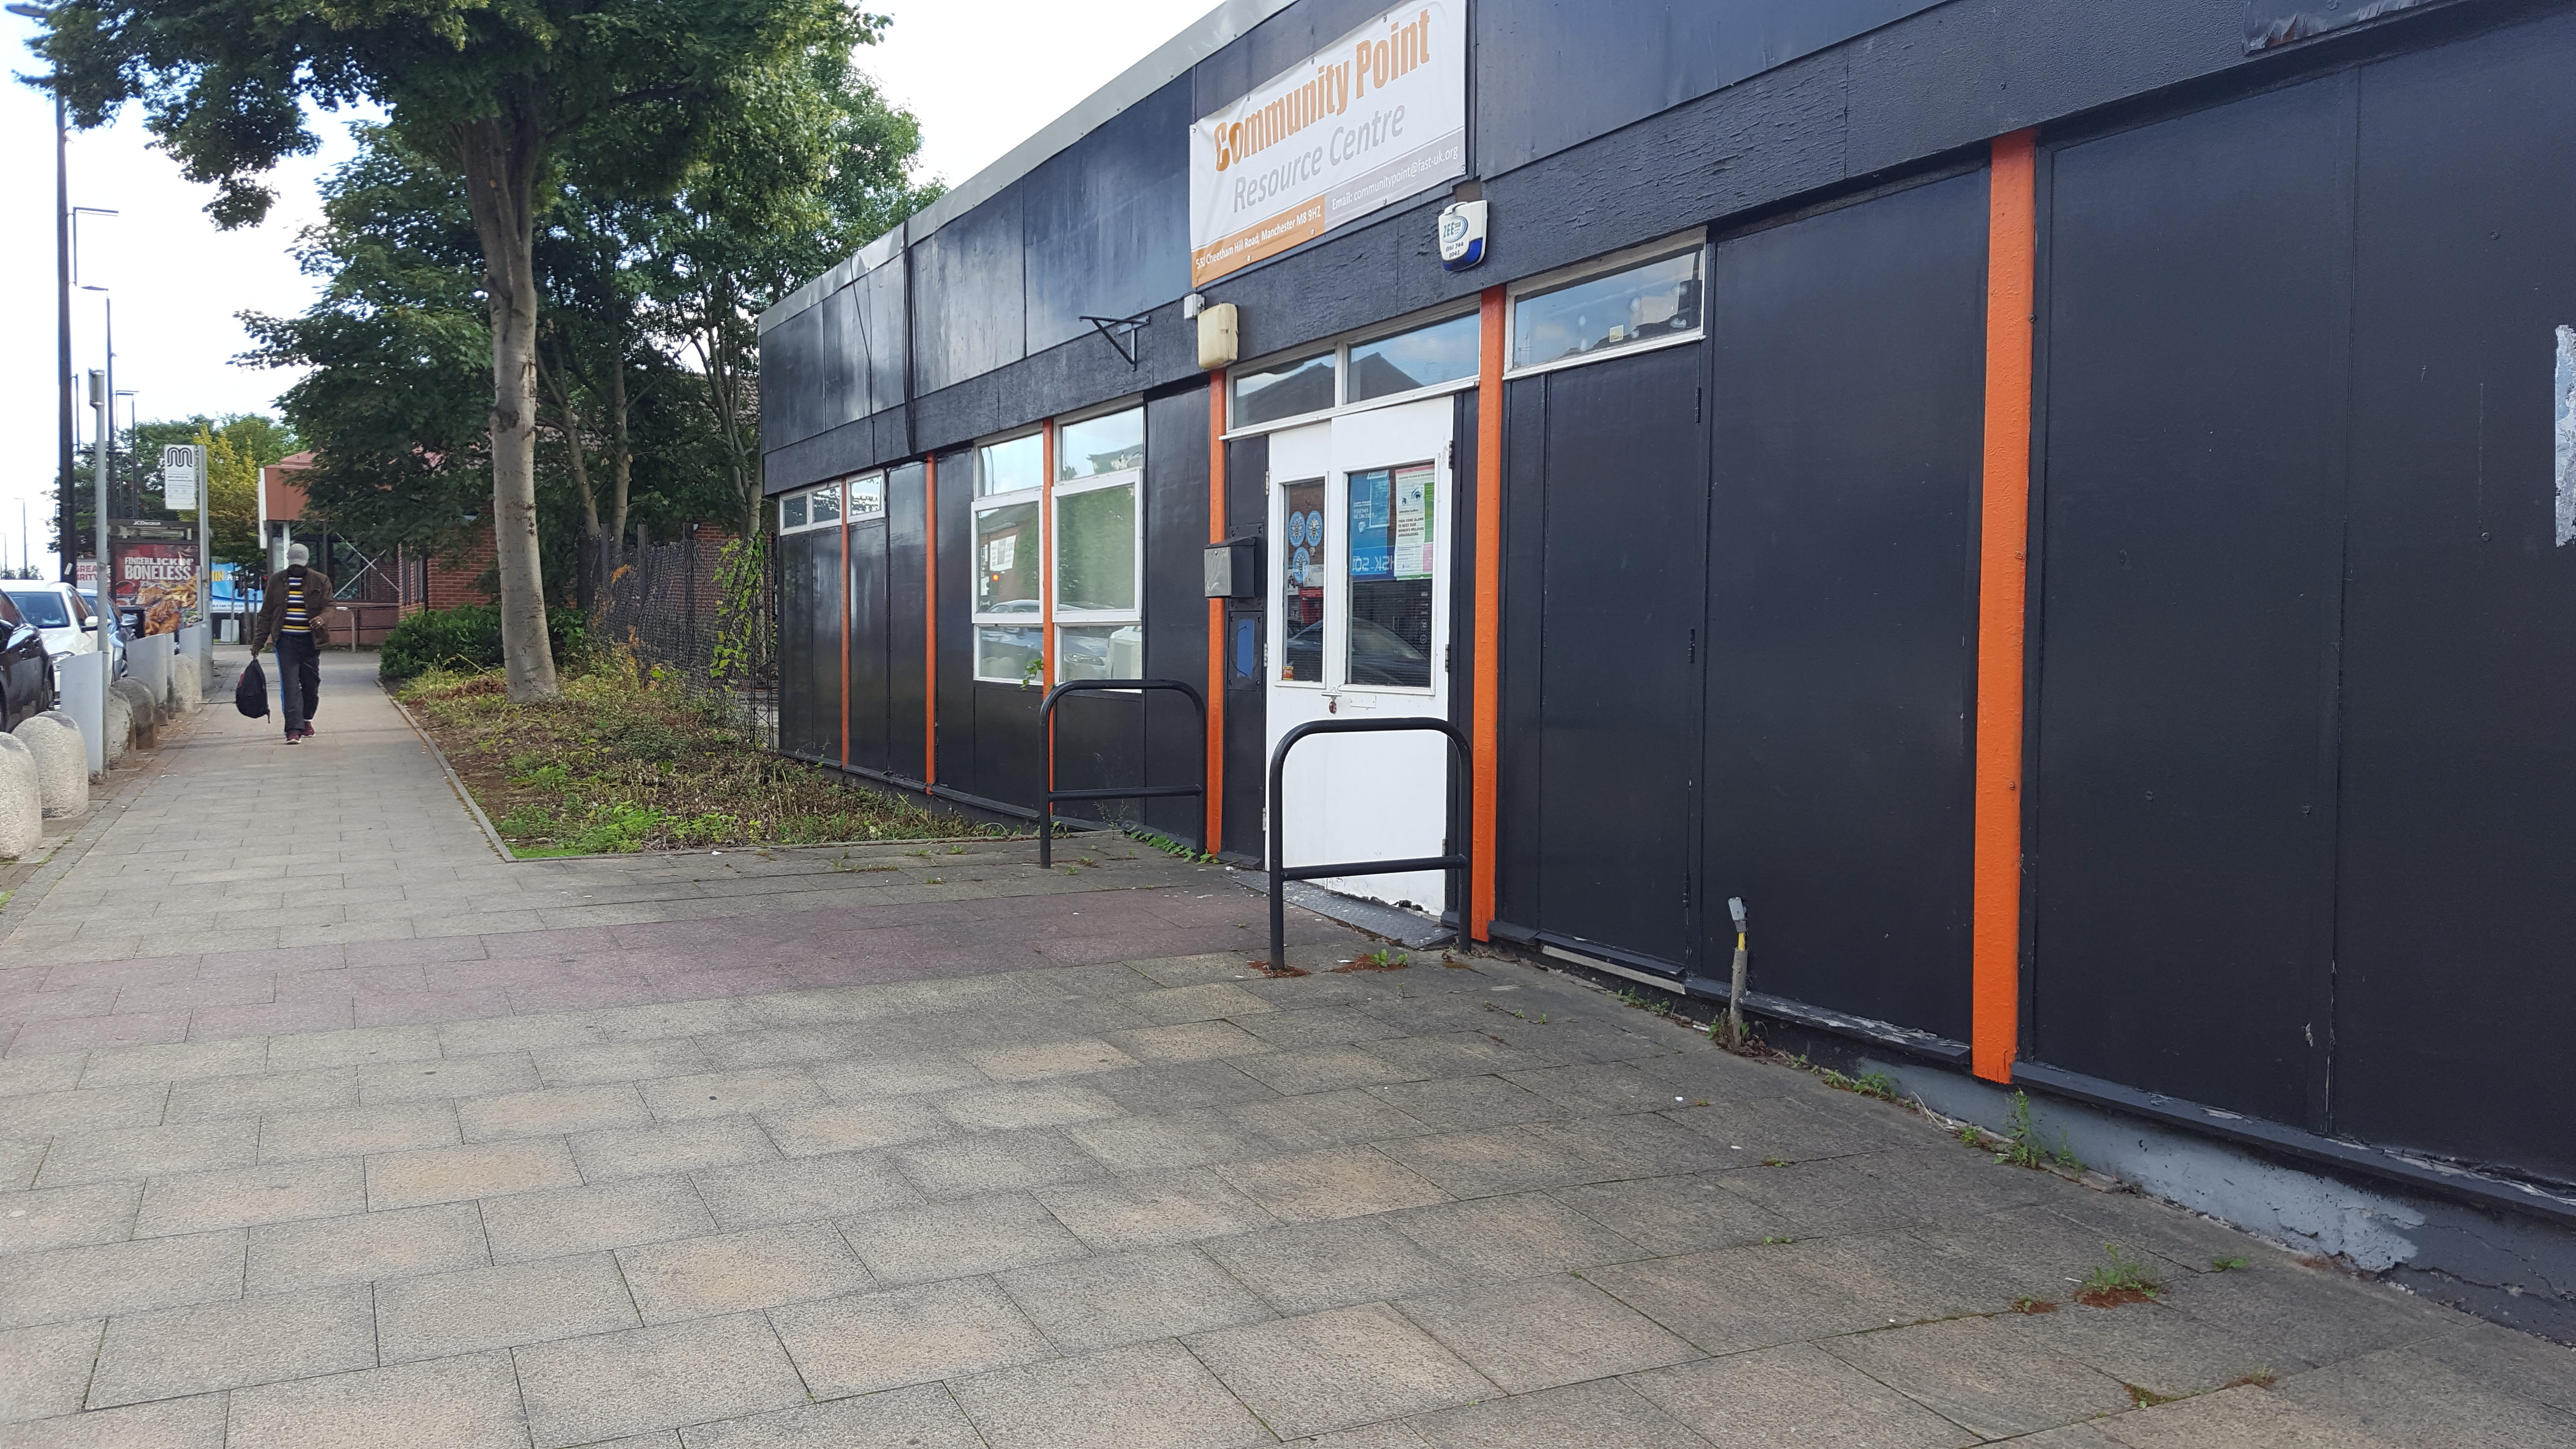 Community Point Resource Centre building